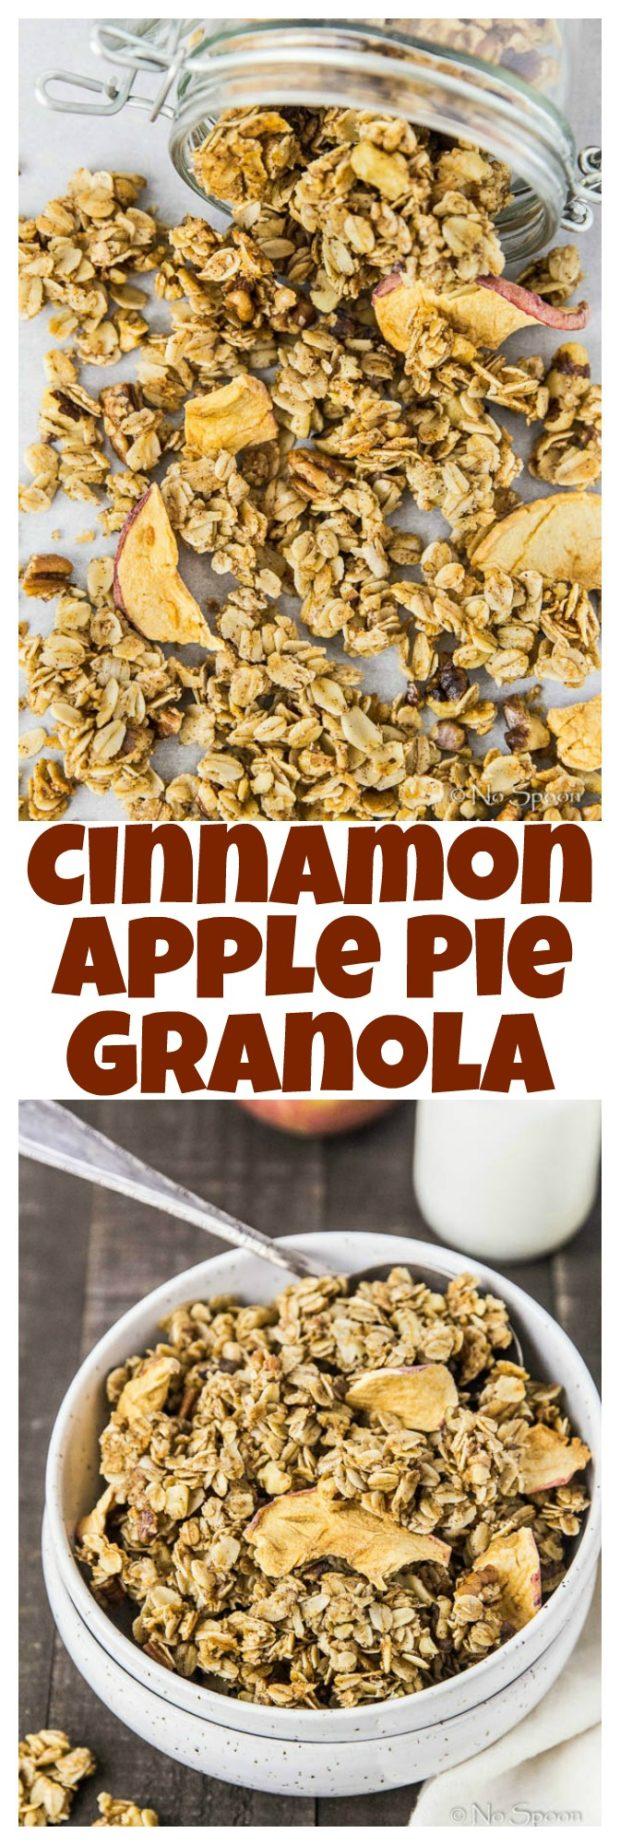 cinnamon-apple-pie-granola-long-pin1